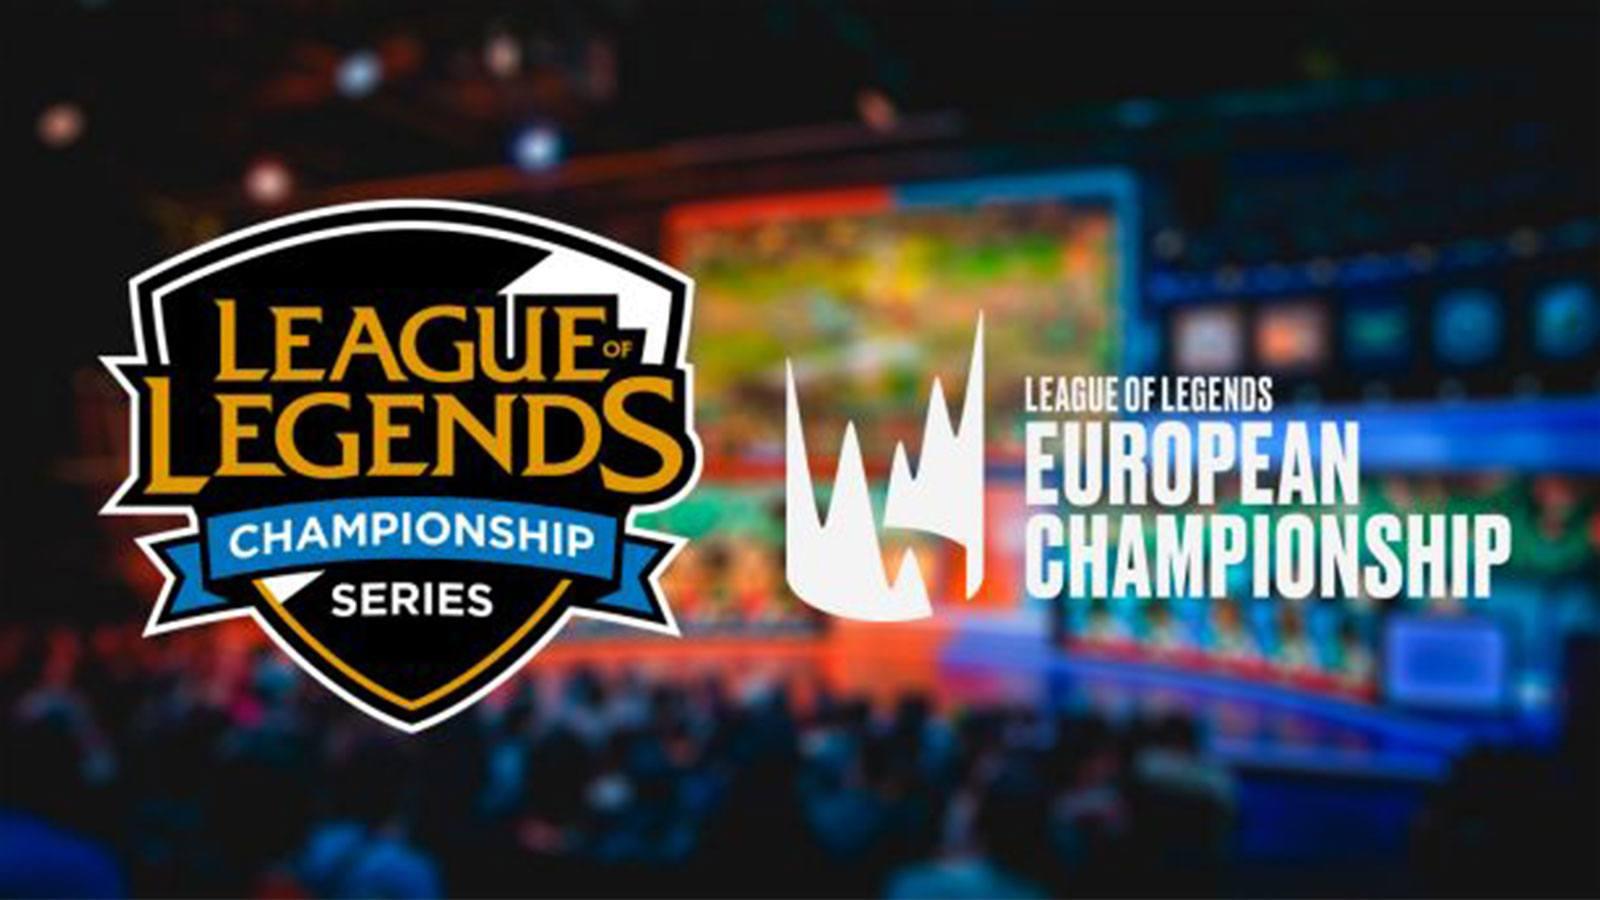 LCS LEC Riot Games League of Legends